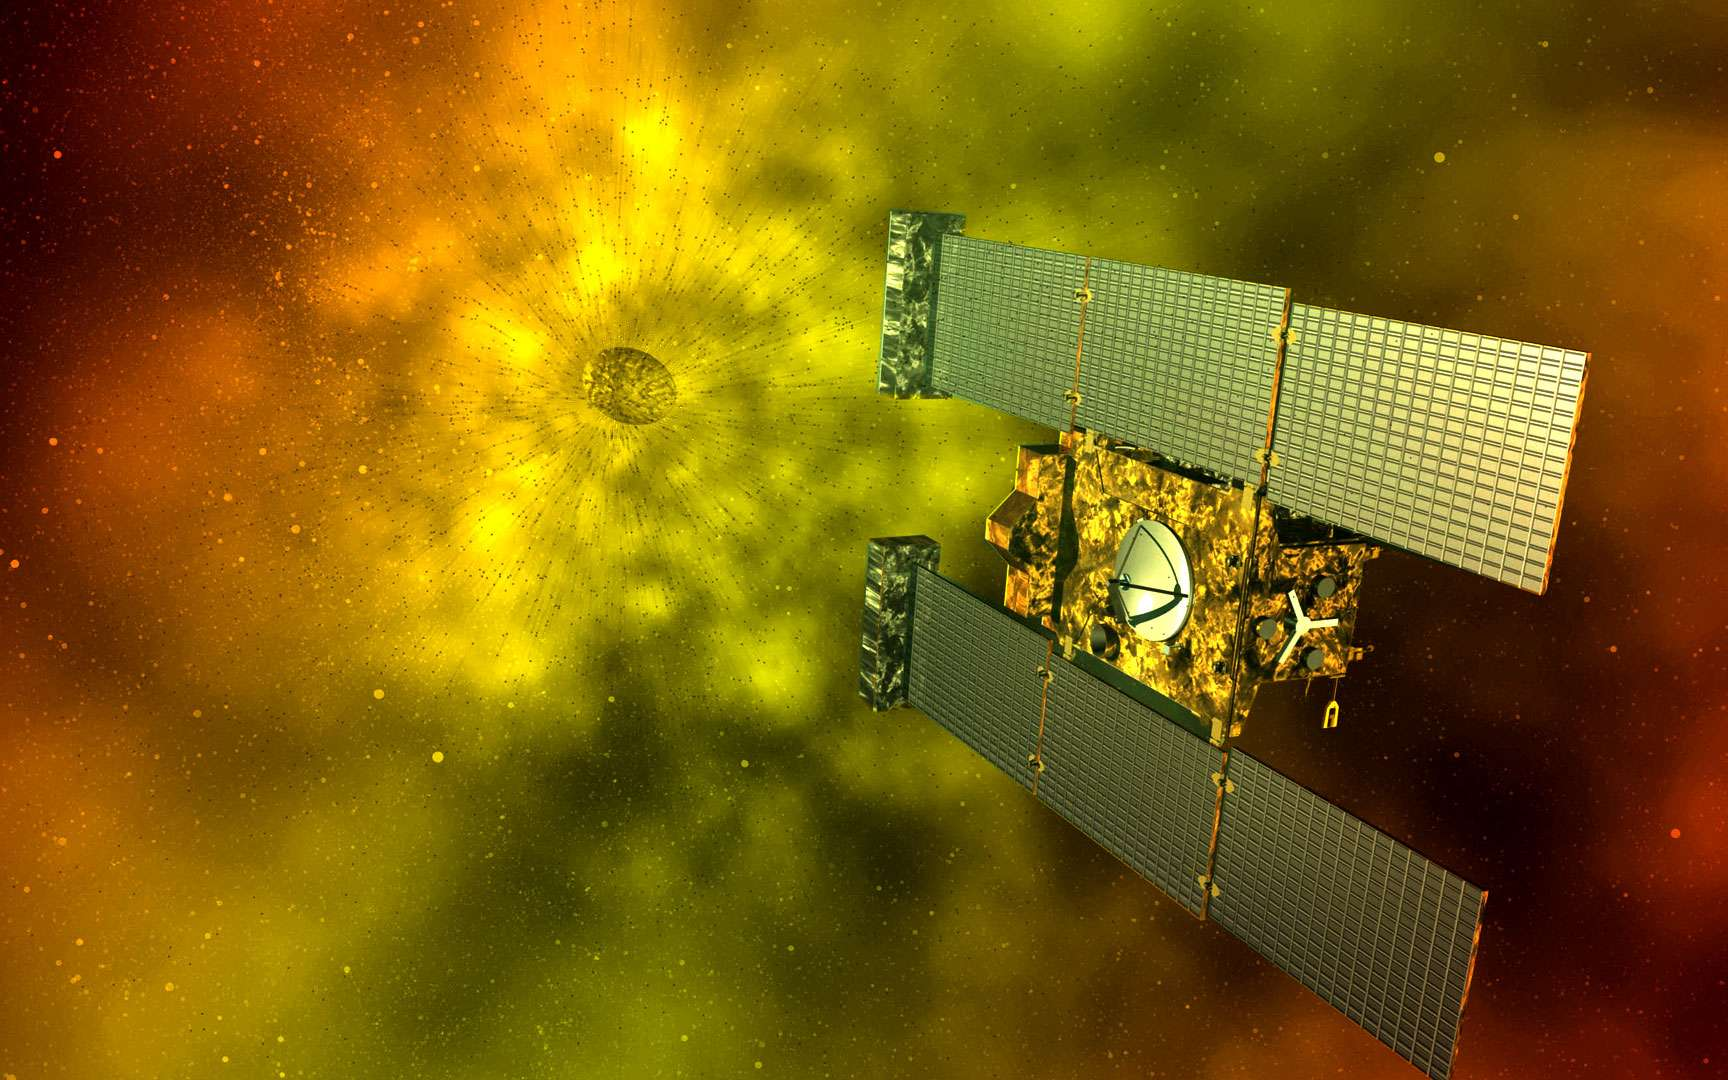 La comète Wild 2. http://stardust.jpl.nasa.gov/science/index.html